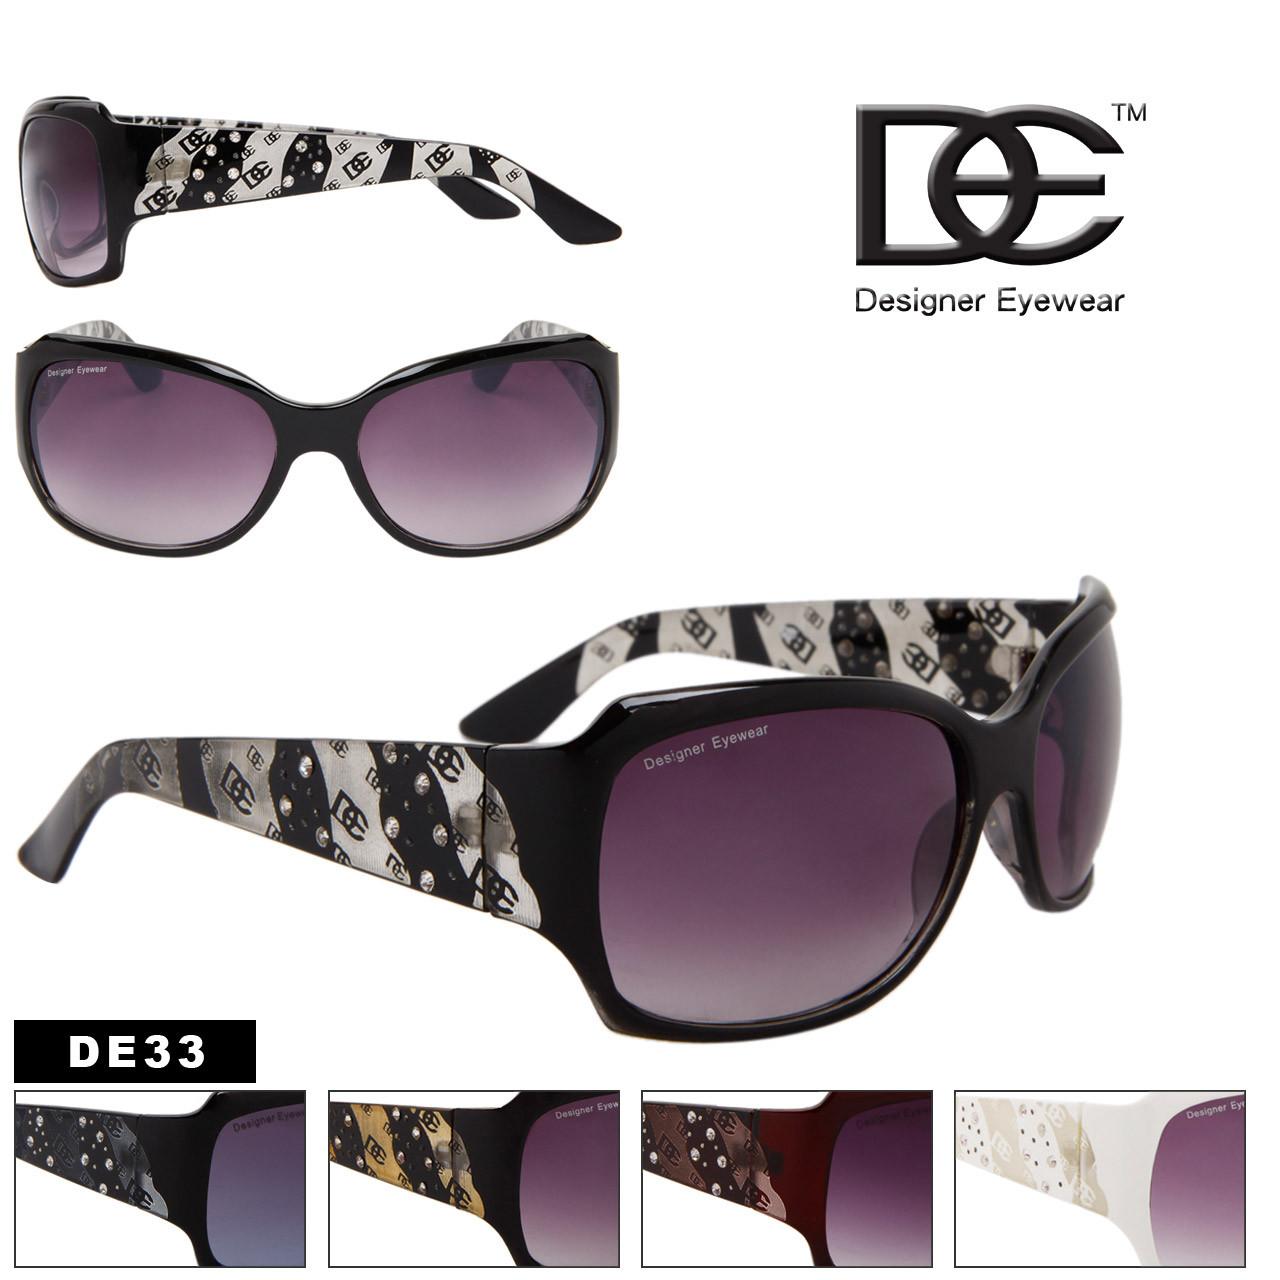 Rhinestone Fashion Sunglasses DE Designer Eyewear DE33